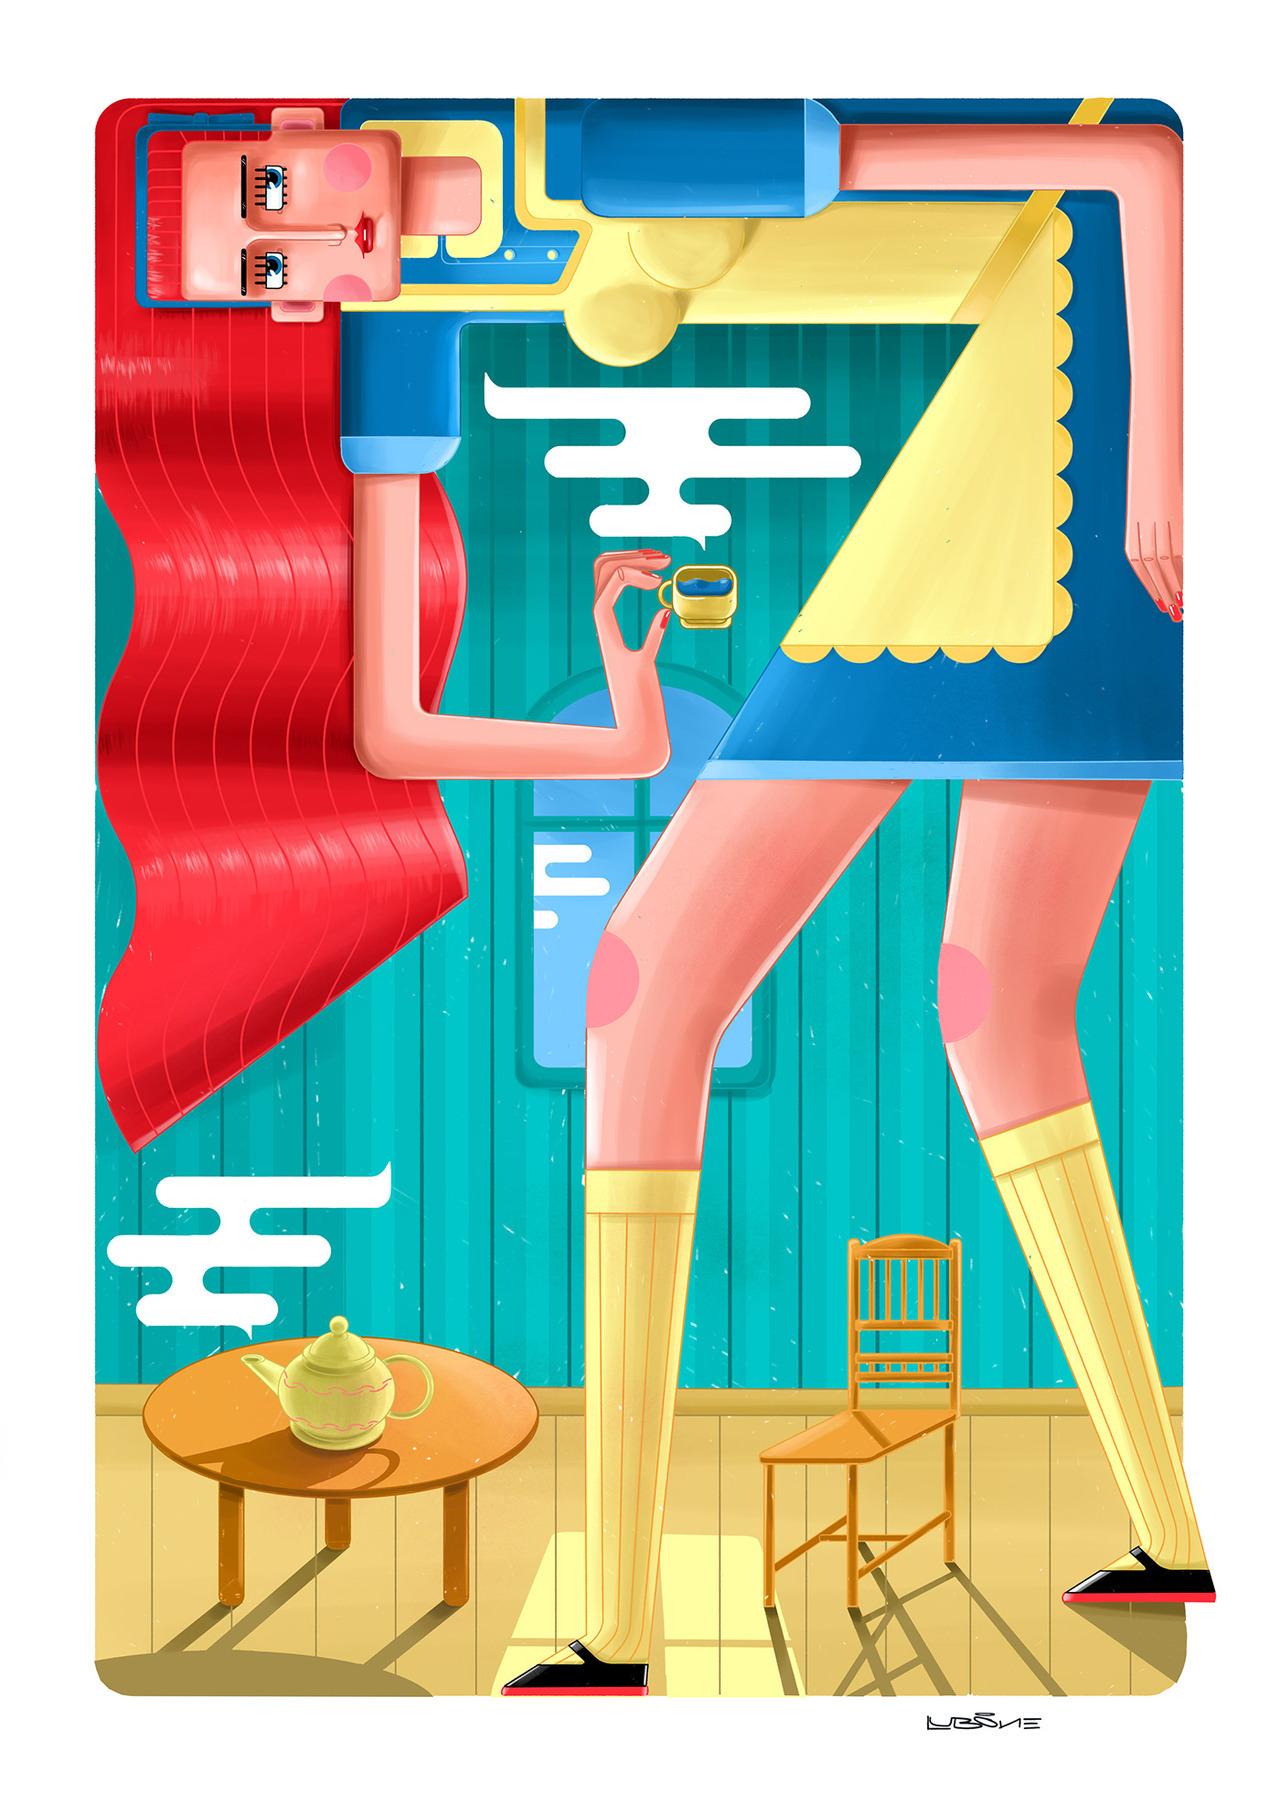 Lub One Иллюстрация, Цифровое искусство, Дизайн персонажей (10).jpg